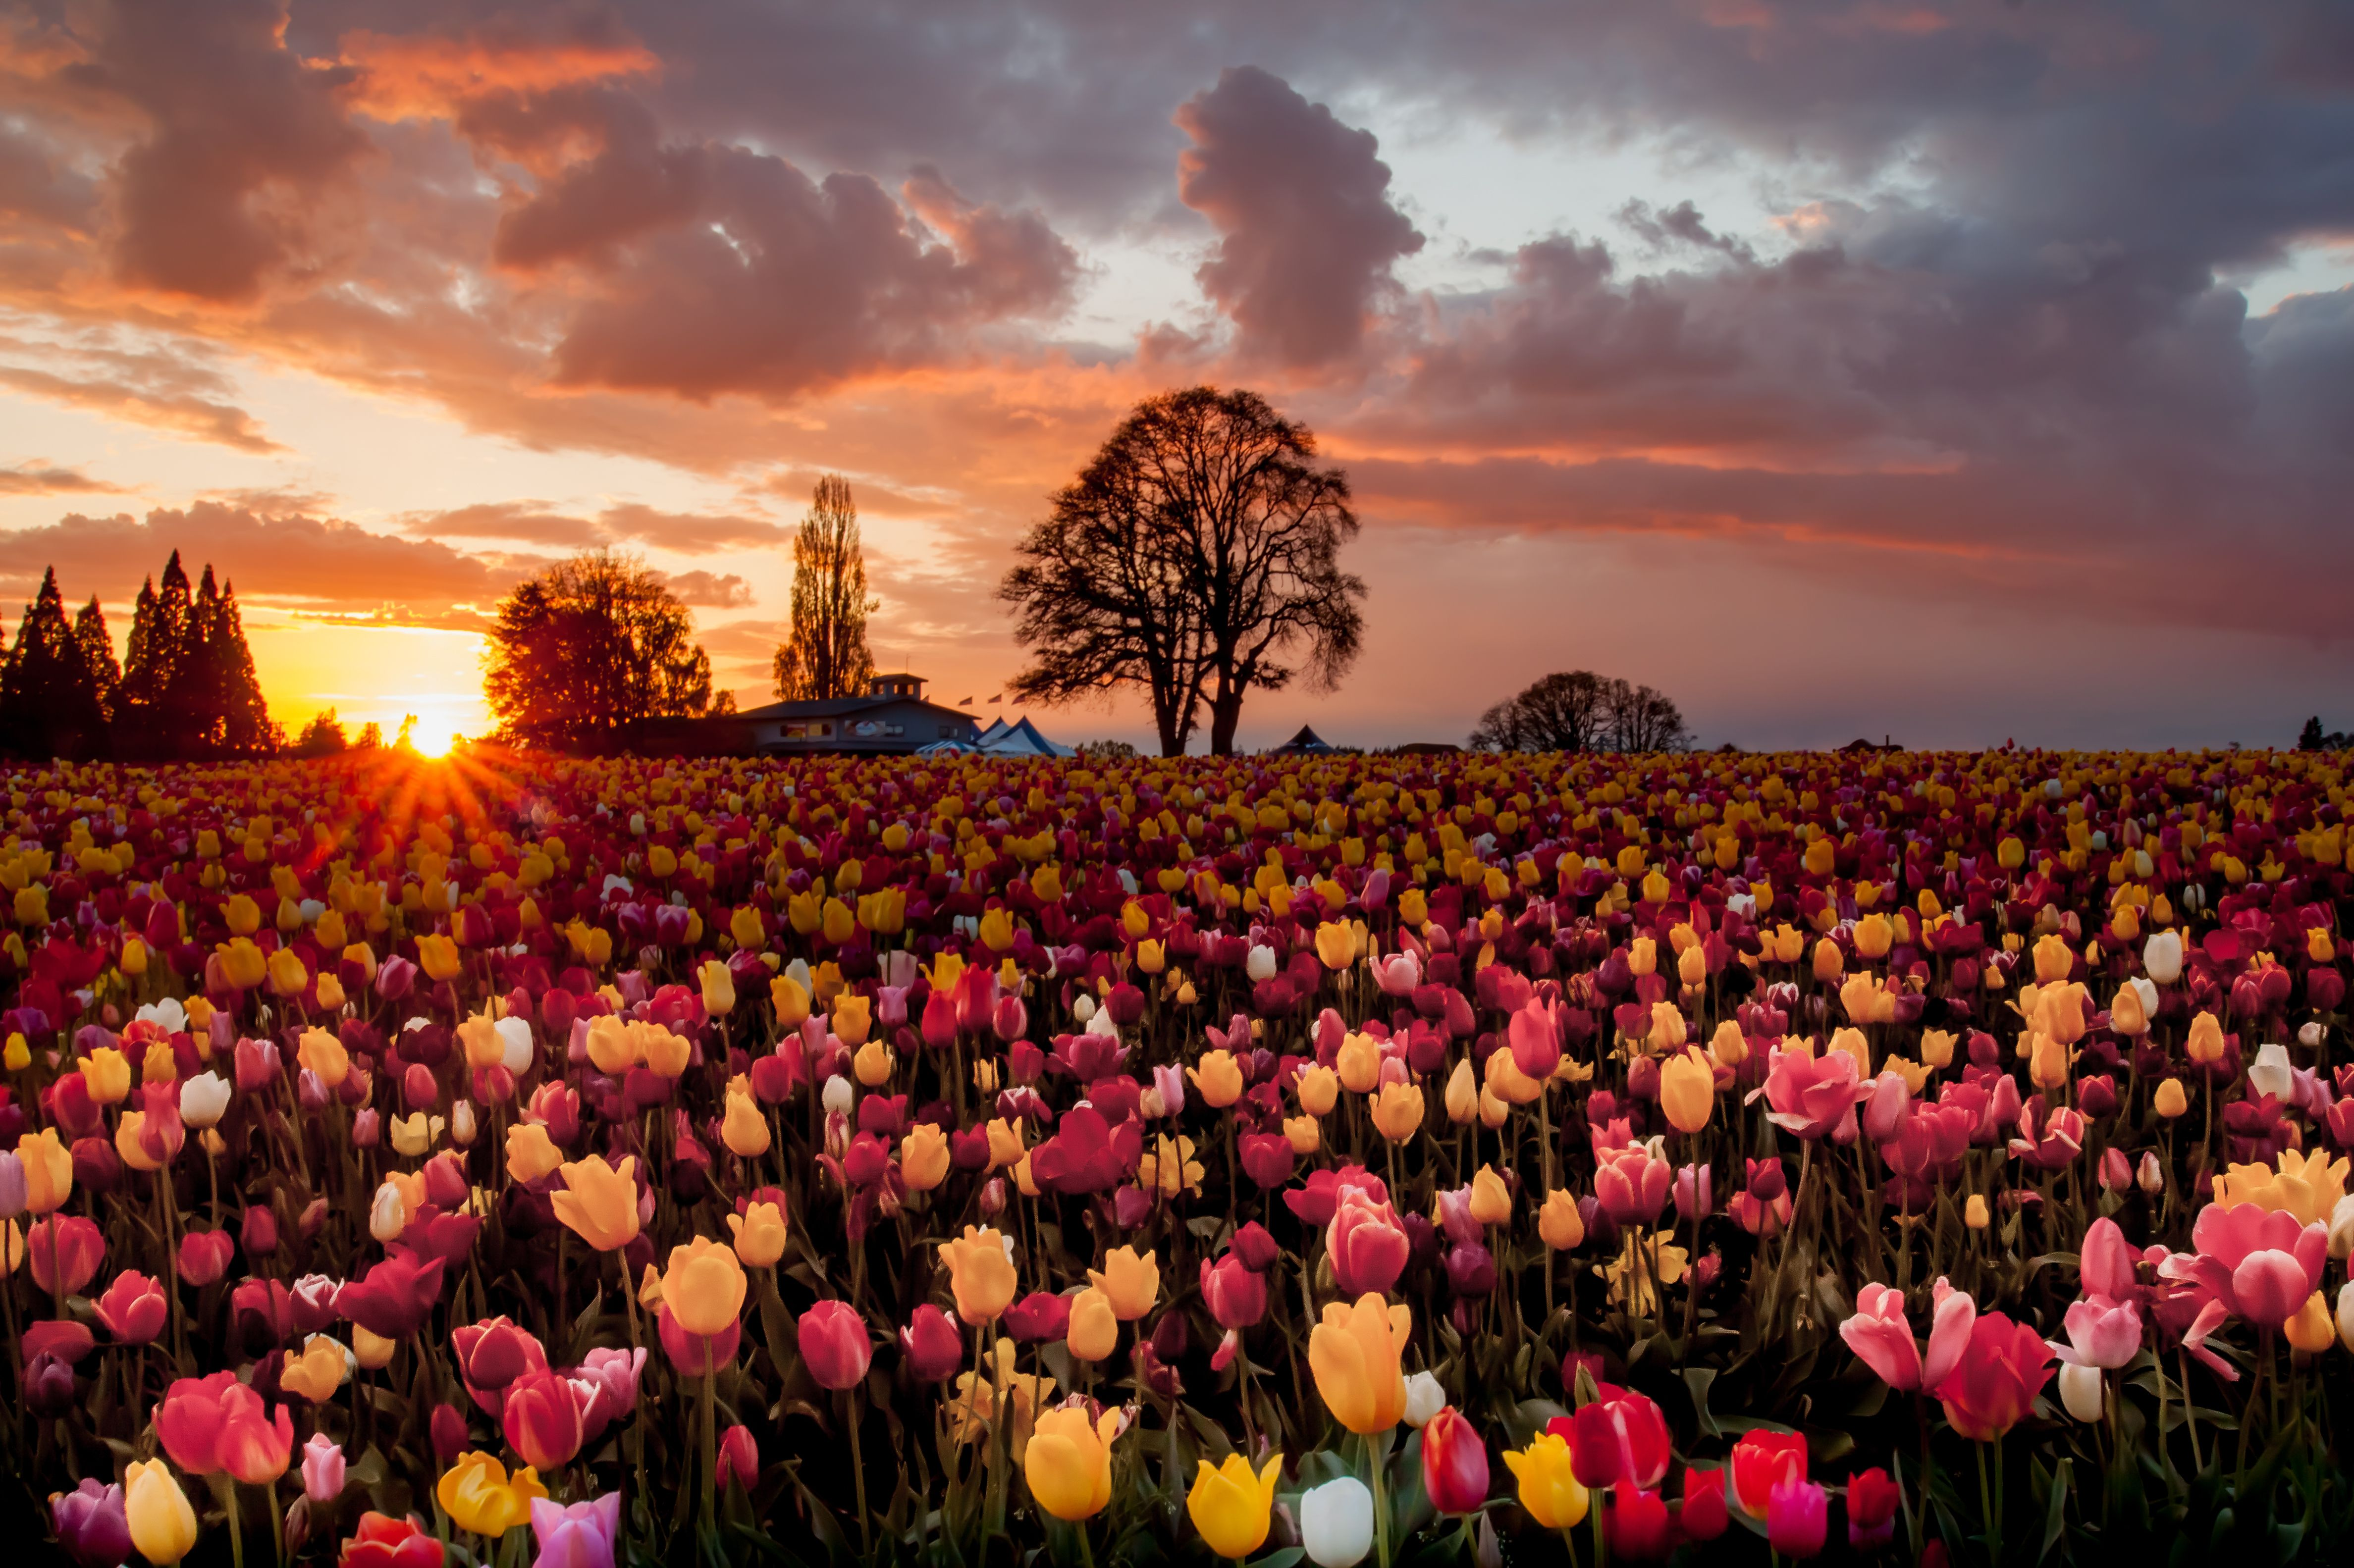 тюльпаны поляна закат  № 3285794 загрузить